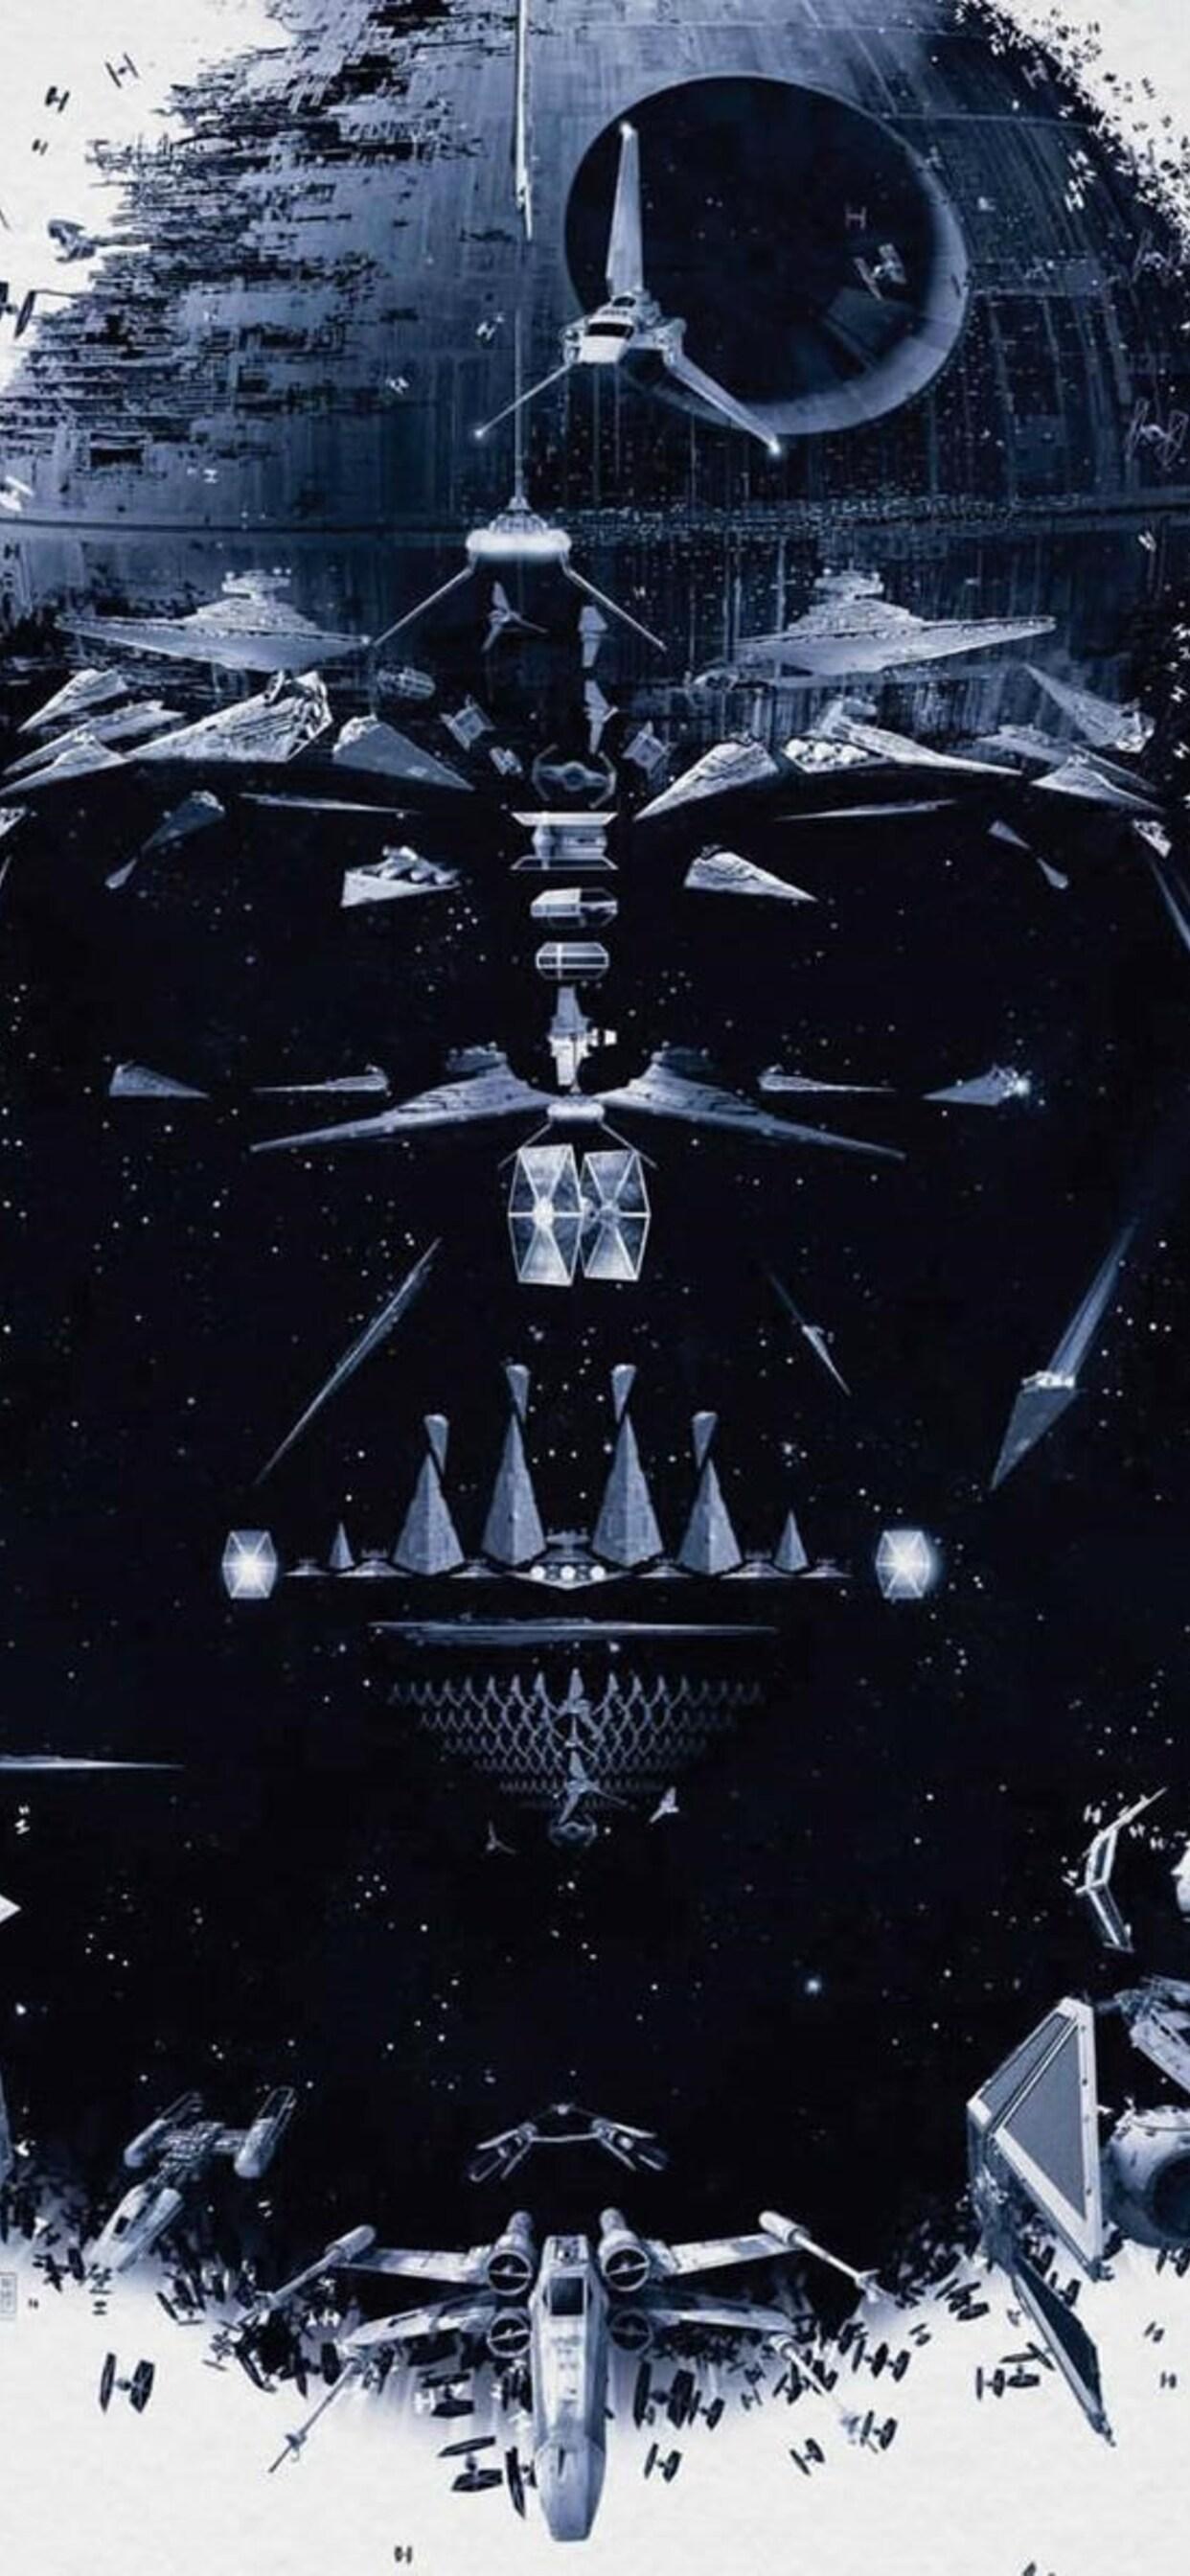 1242x2688 Darth Vader Amazing Art Iphone Xs Max Hd 4k